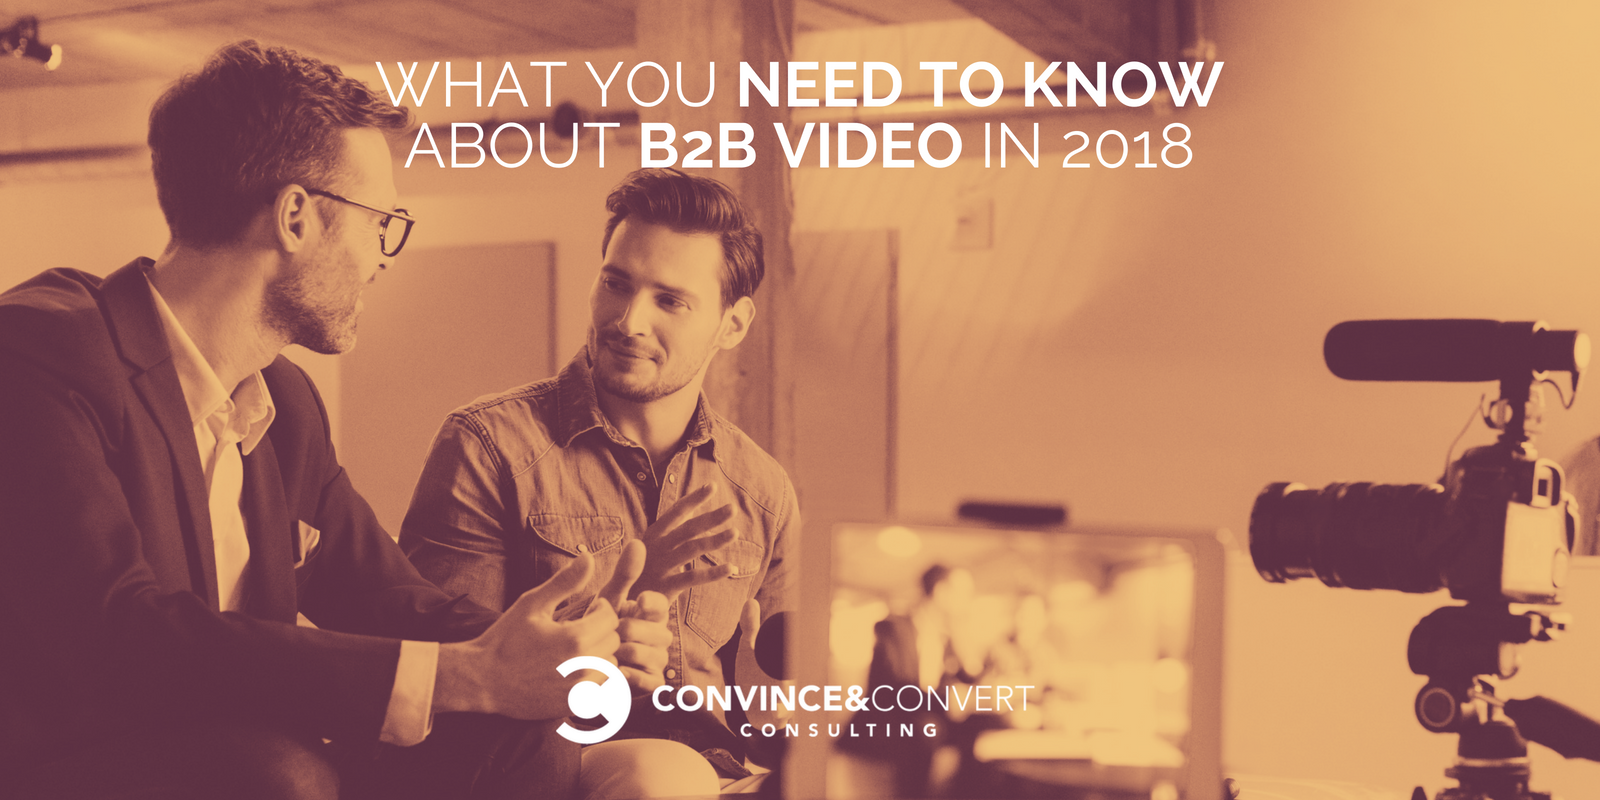 b2b video 2018